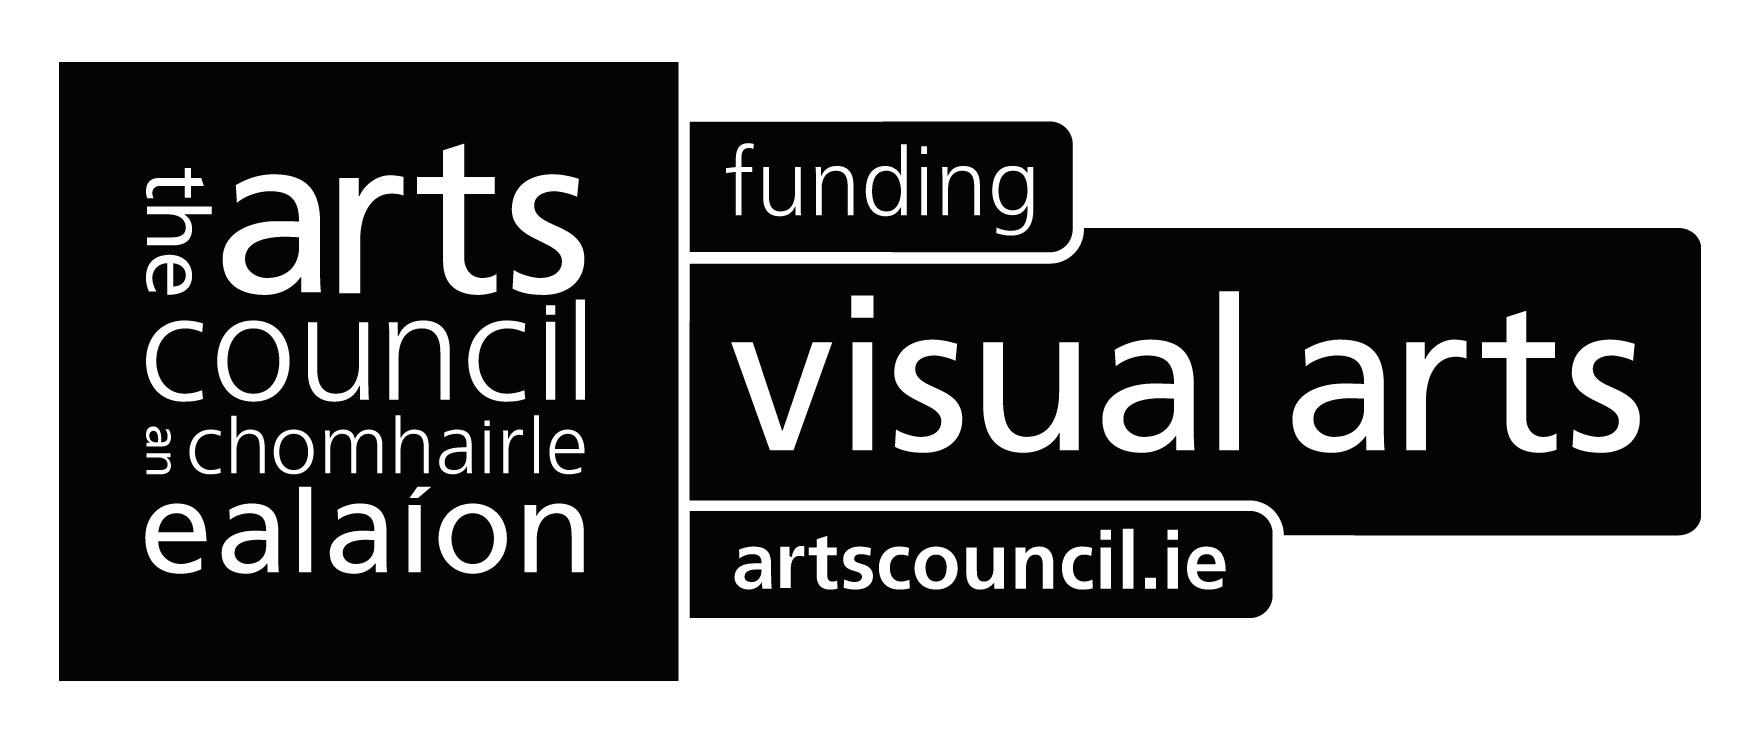 Arts Council of Ireland_logo.jpg